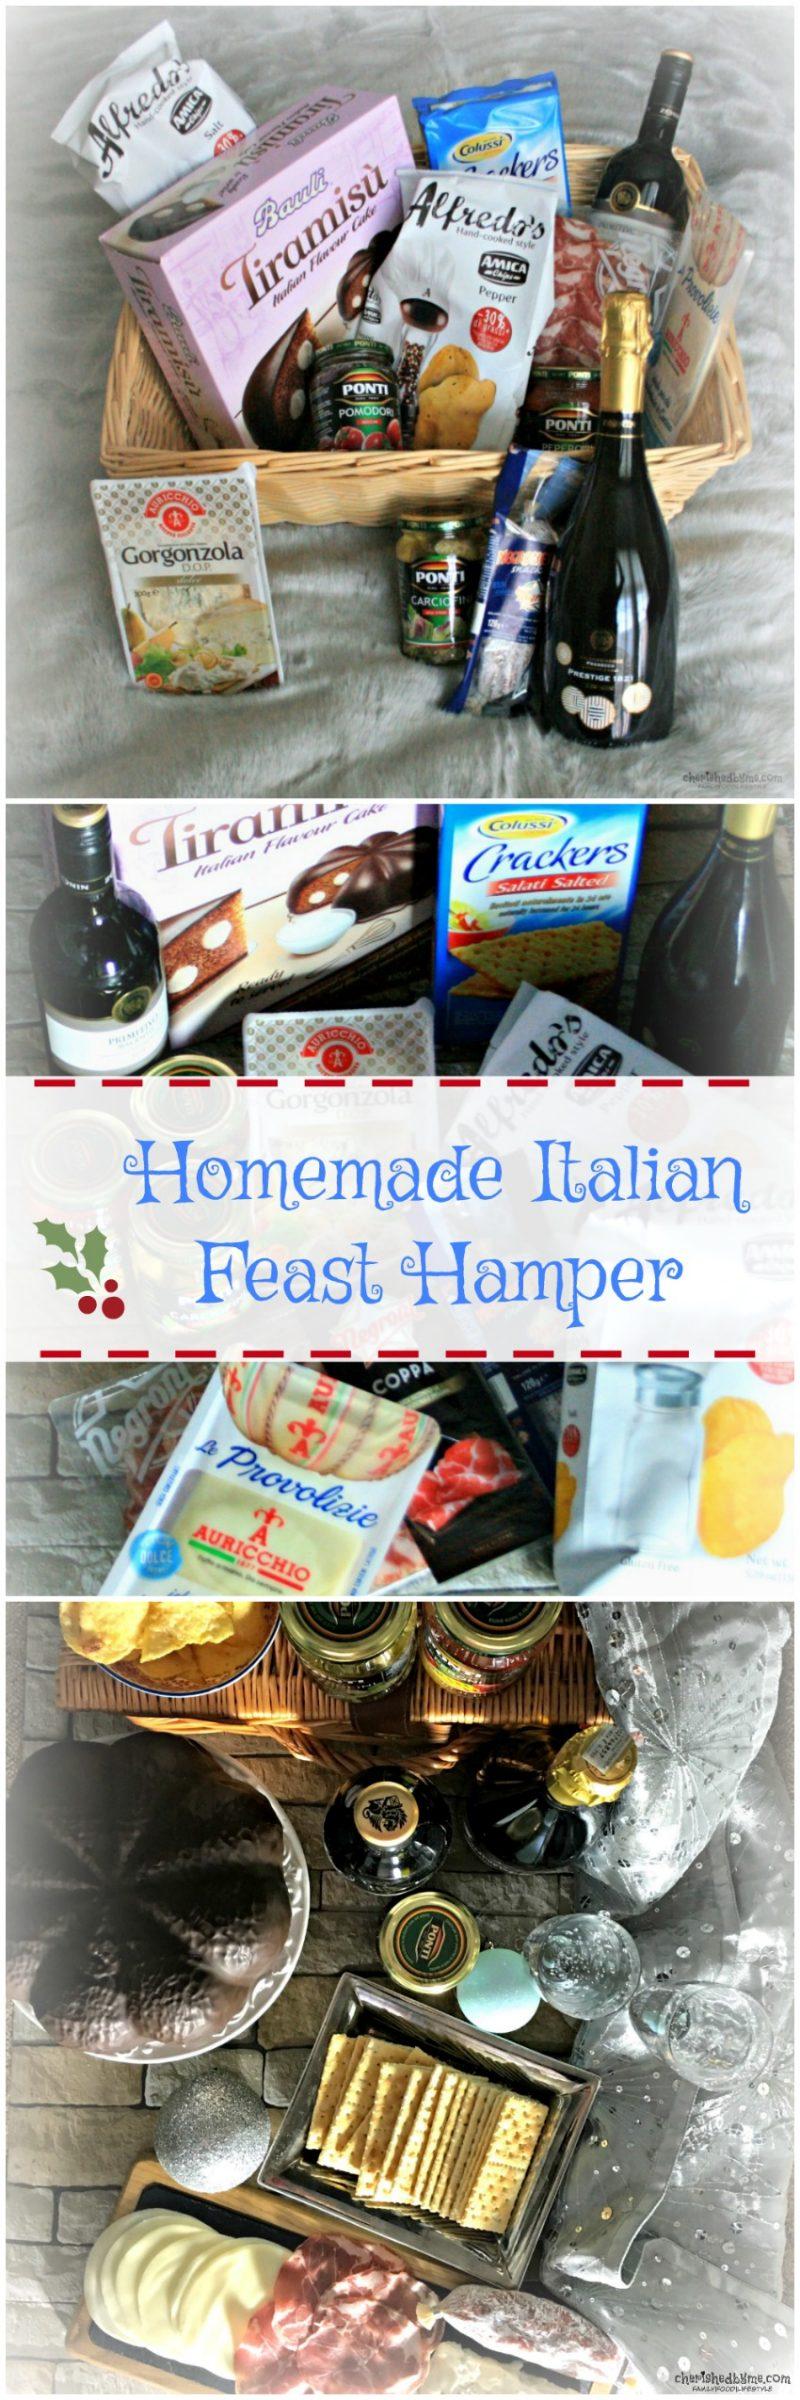 homemade-italian-feast-hamper-cherishedbyme-com